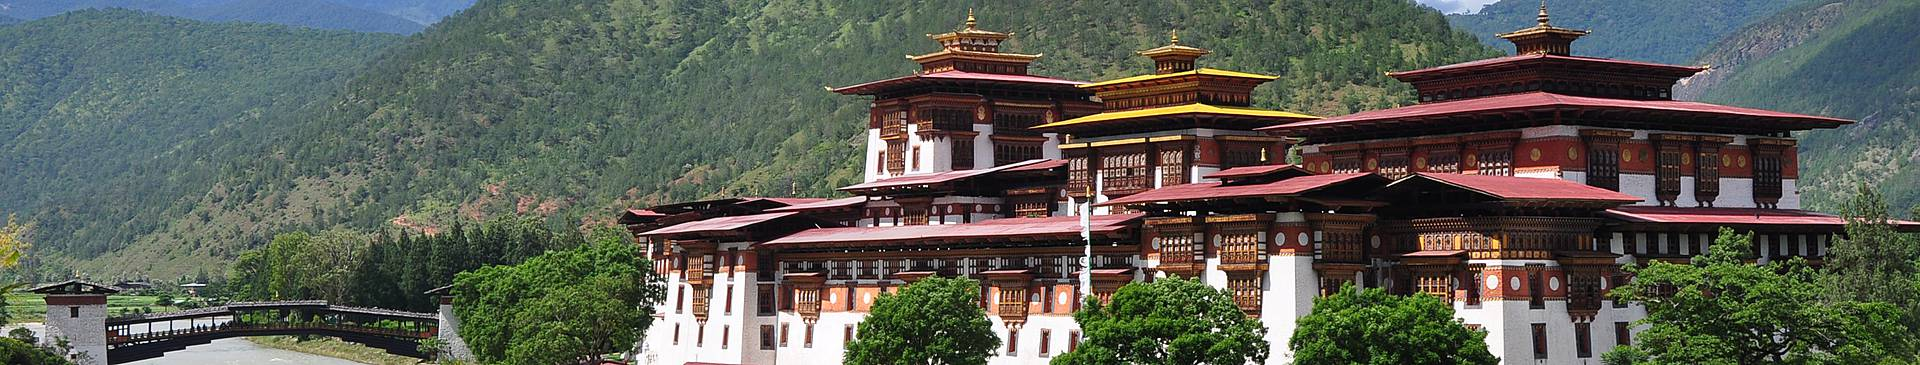 Viaggi in Bhutan in estate